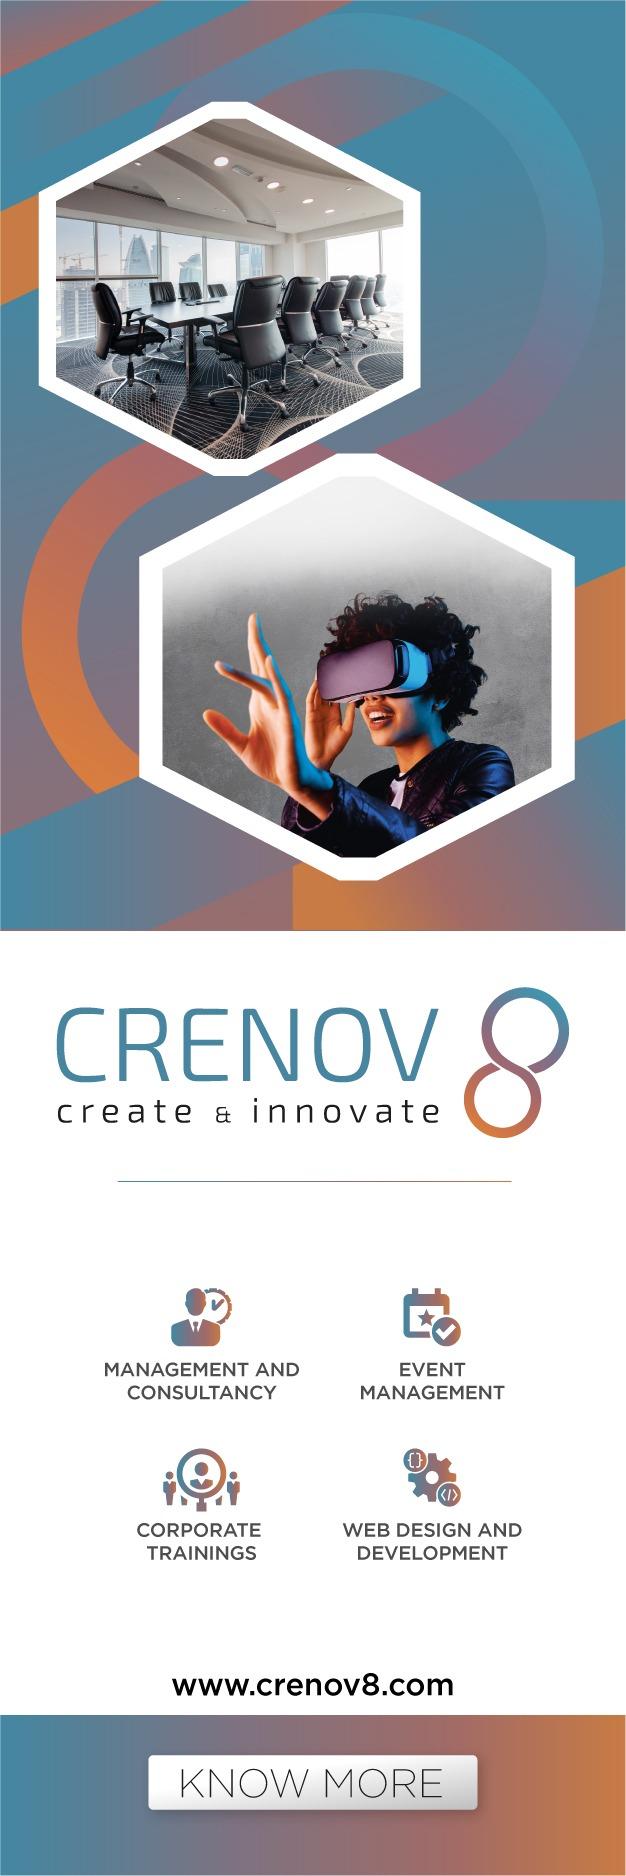 Crenov8